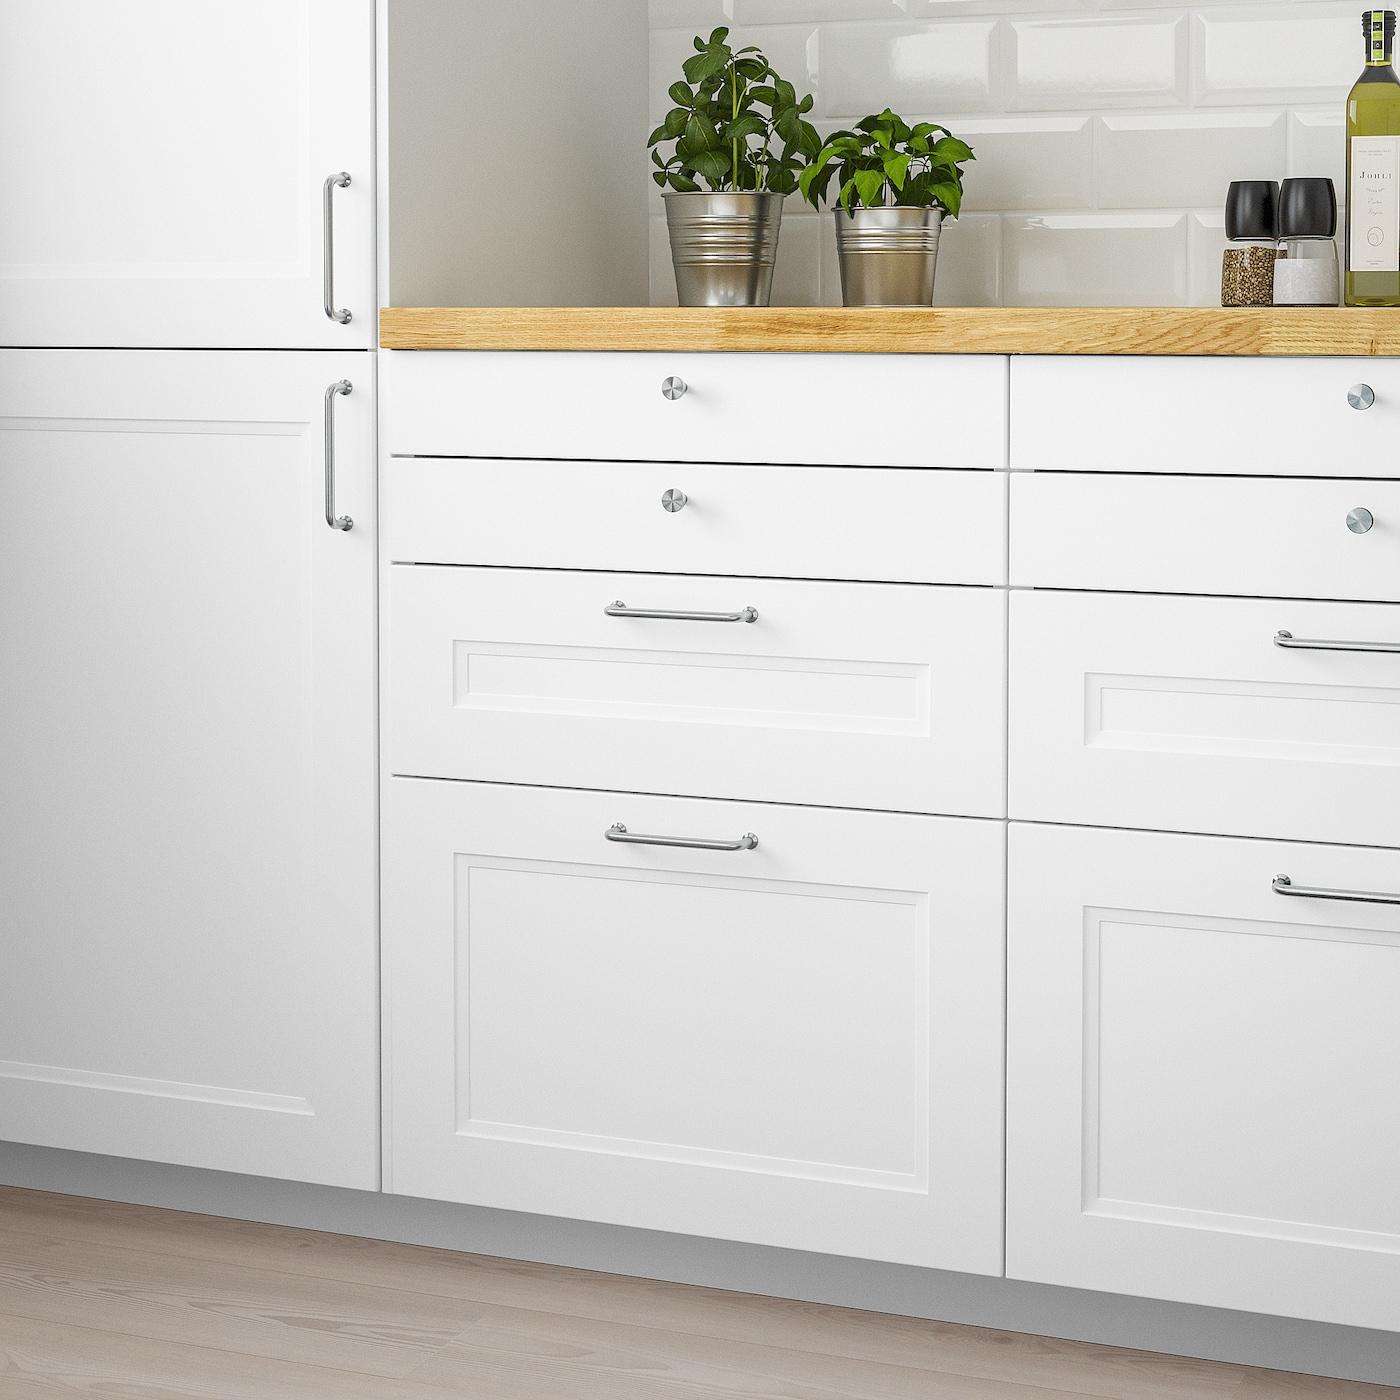 AXSTAD Drawer front - matt white 9x9 cm